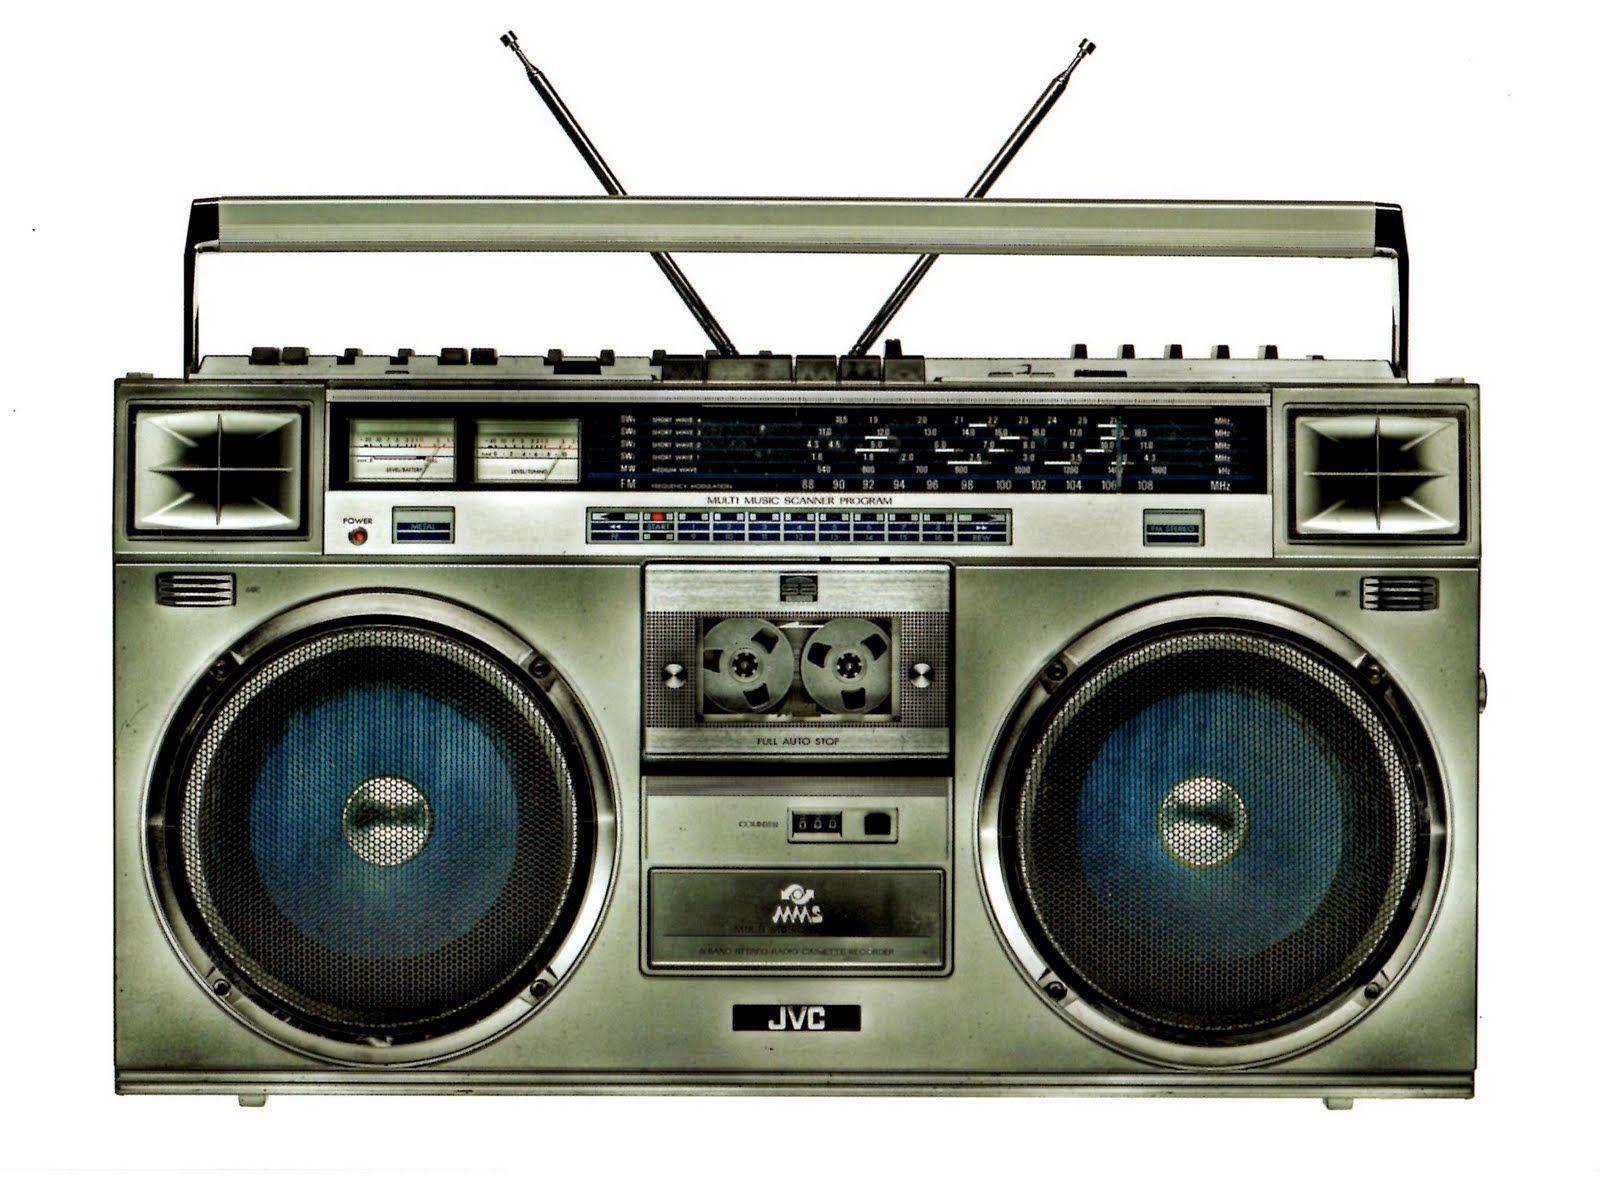 43 best 80's 90's boom box radio images on Pinterest ...  |80s Boombox